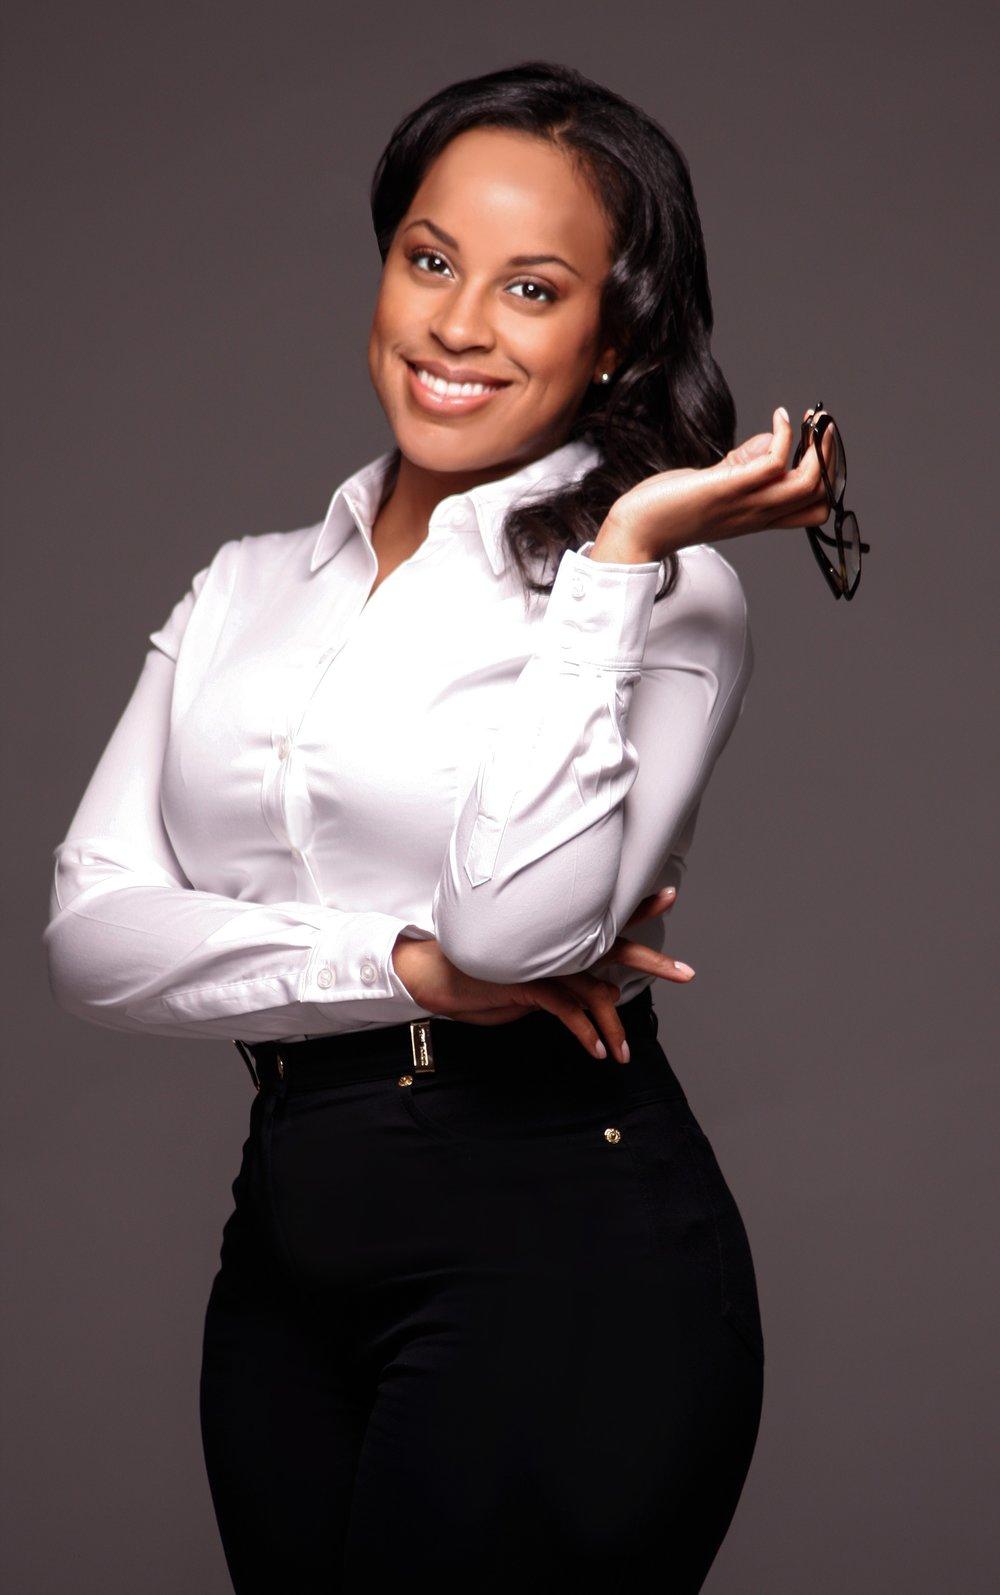 Aisha Taylor promo headshot.jpg